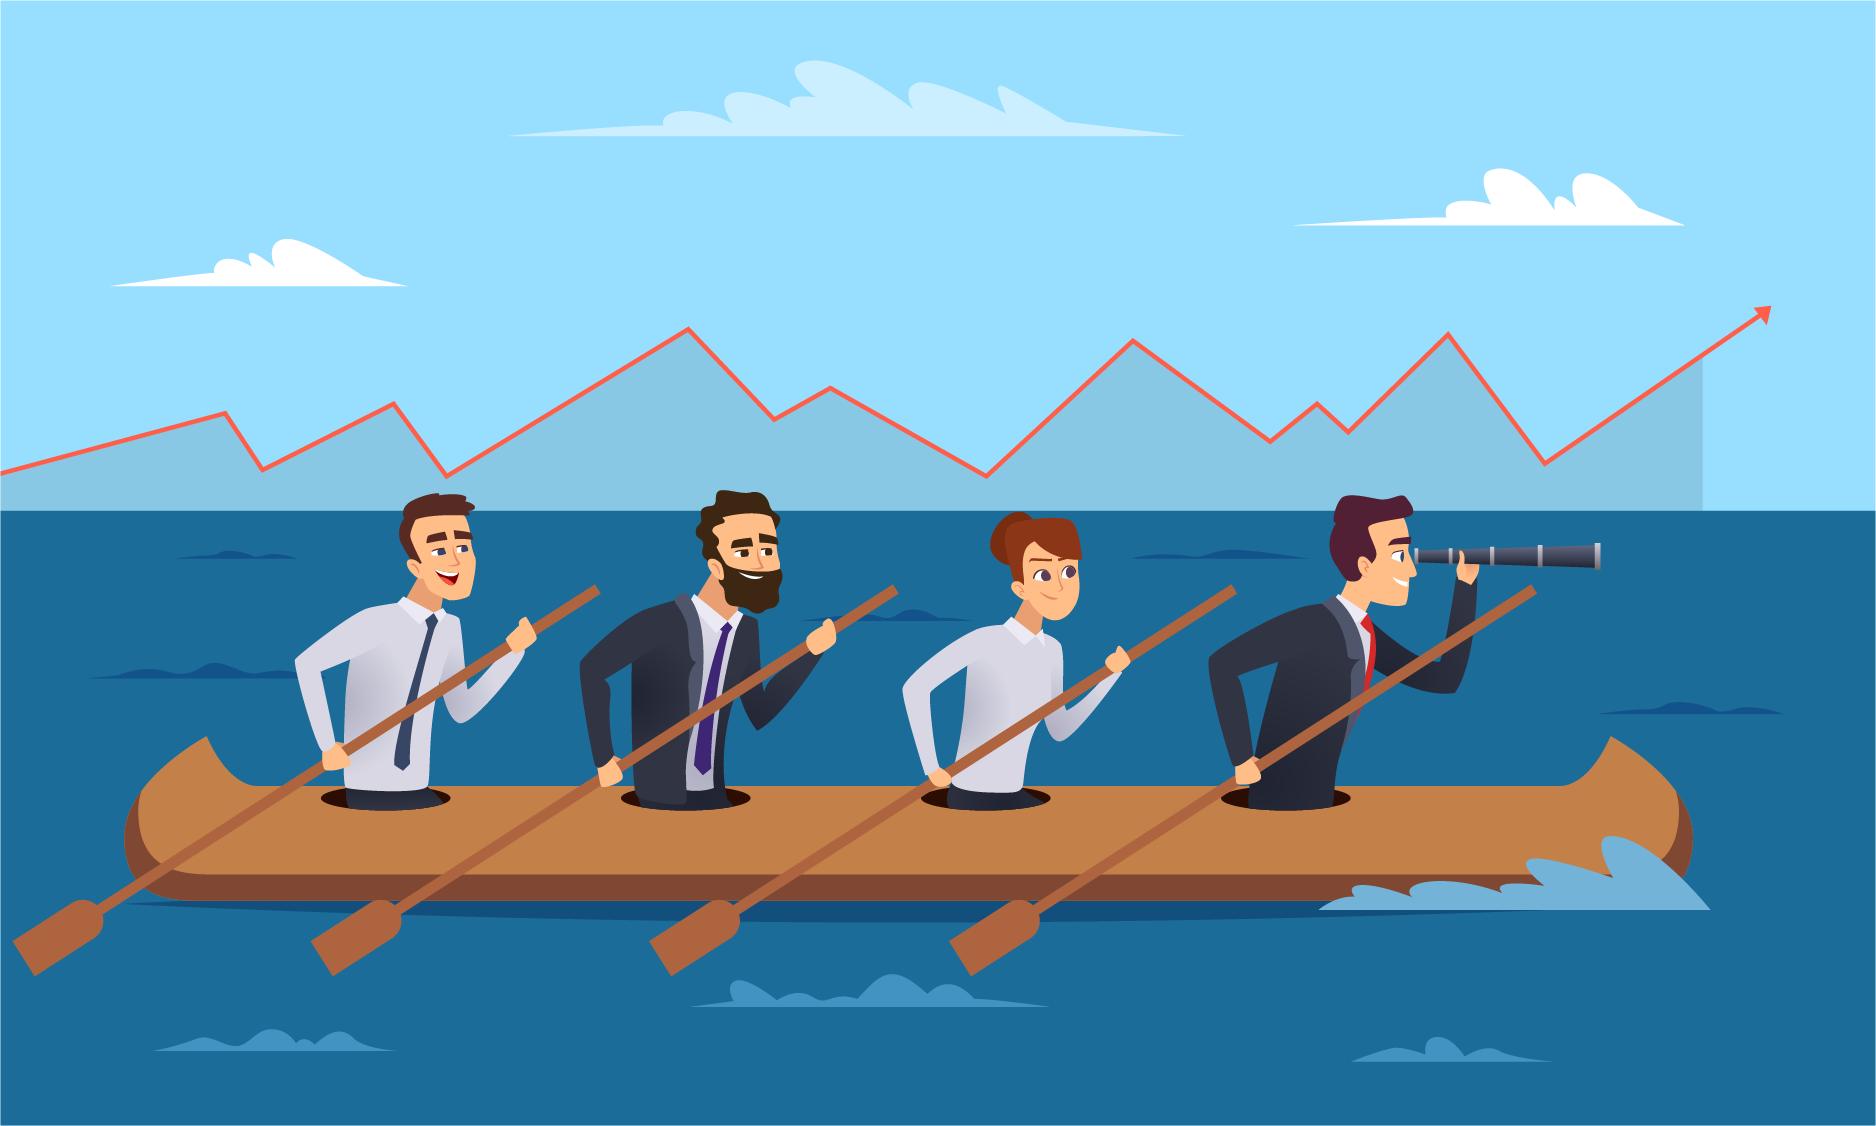 Structural-vs.-Entrepreneurial-Leadership-Sept-2019-01